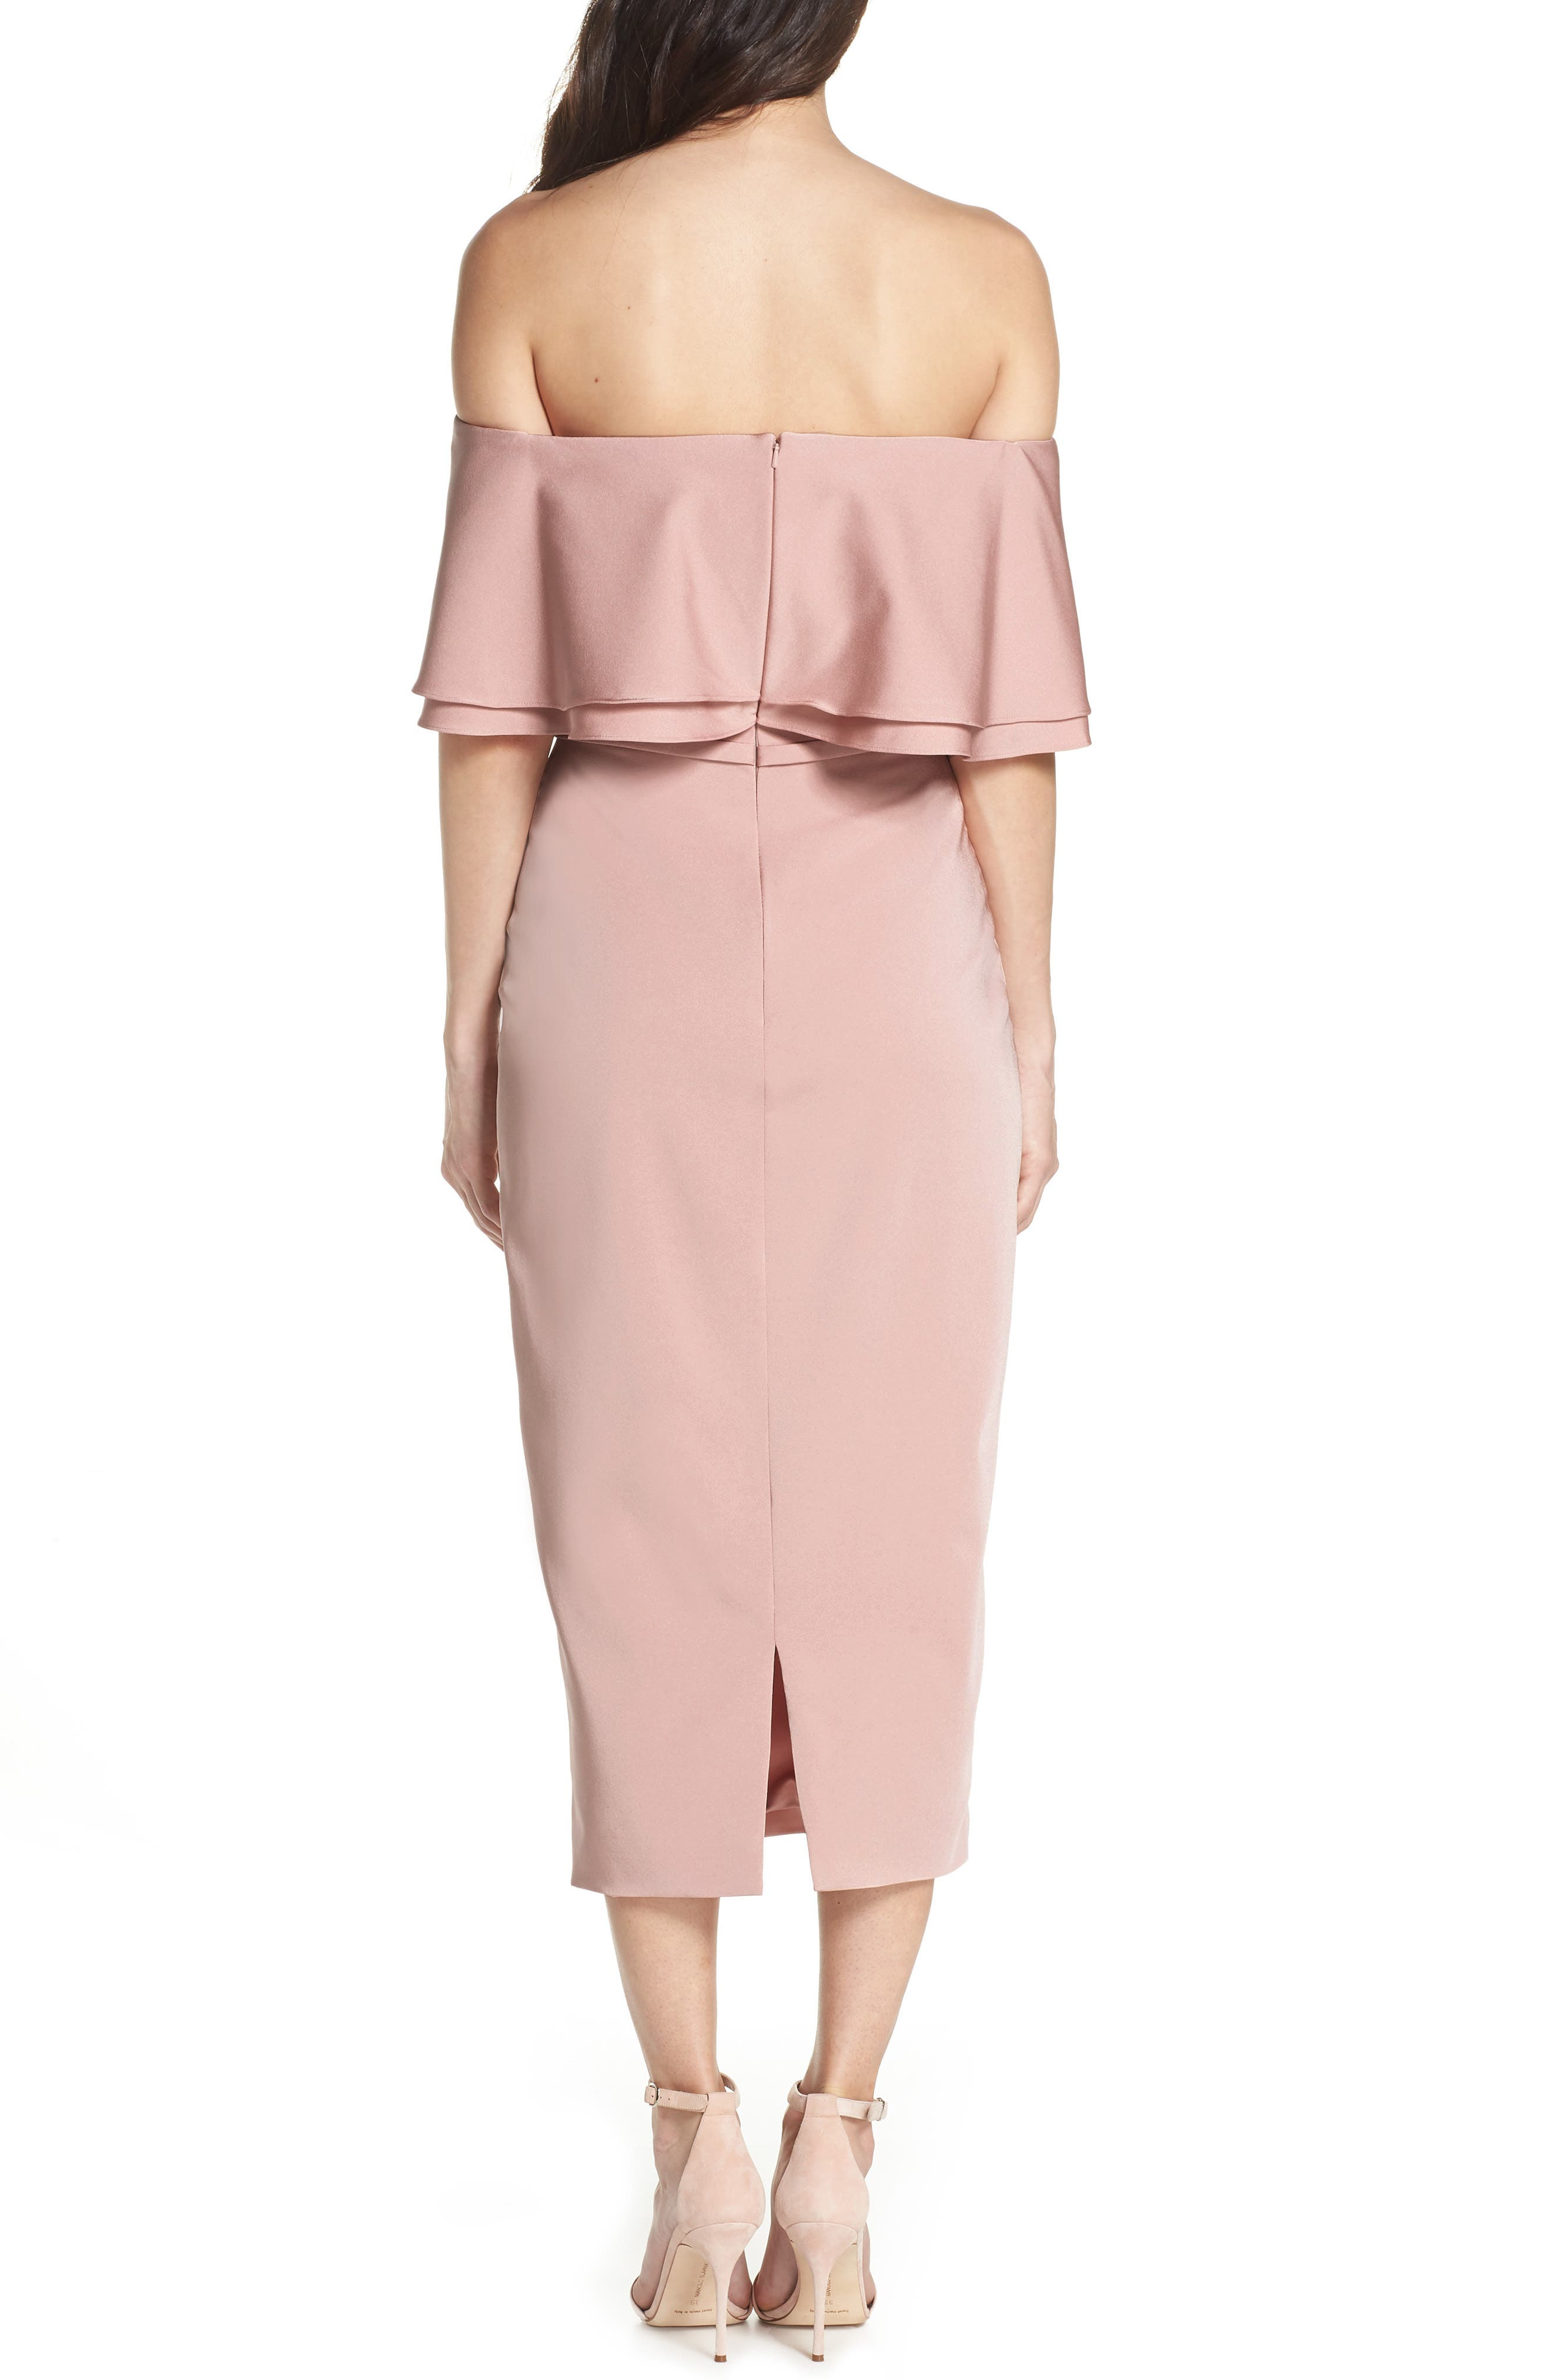 Ruffle Off the Shoulder Tea Length Dress,                             Alternate thumbnail 2, color,                             Rose